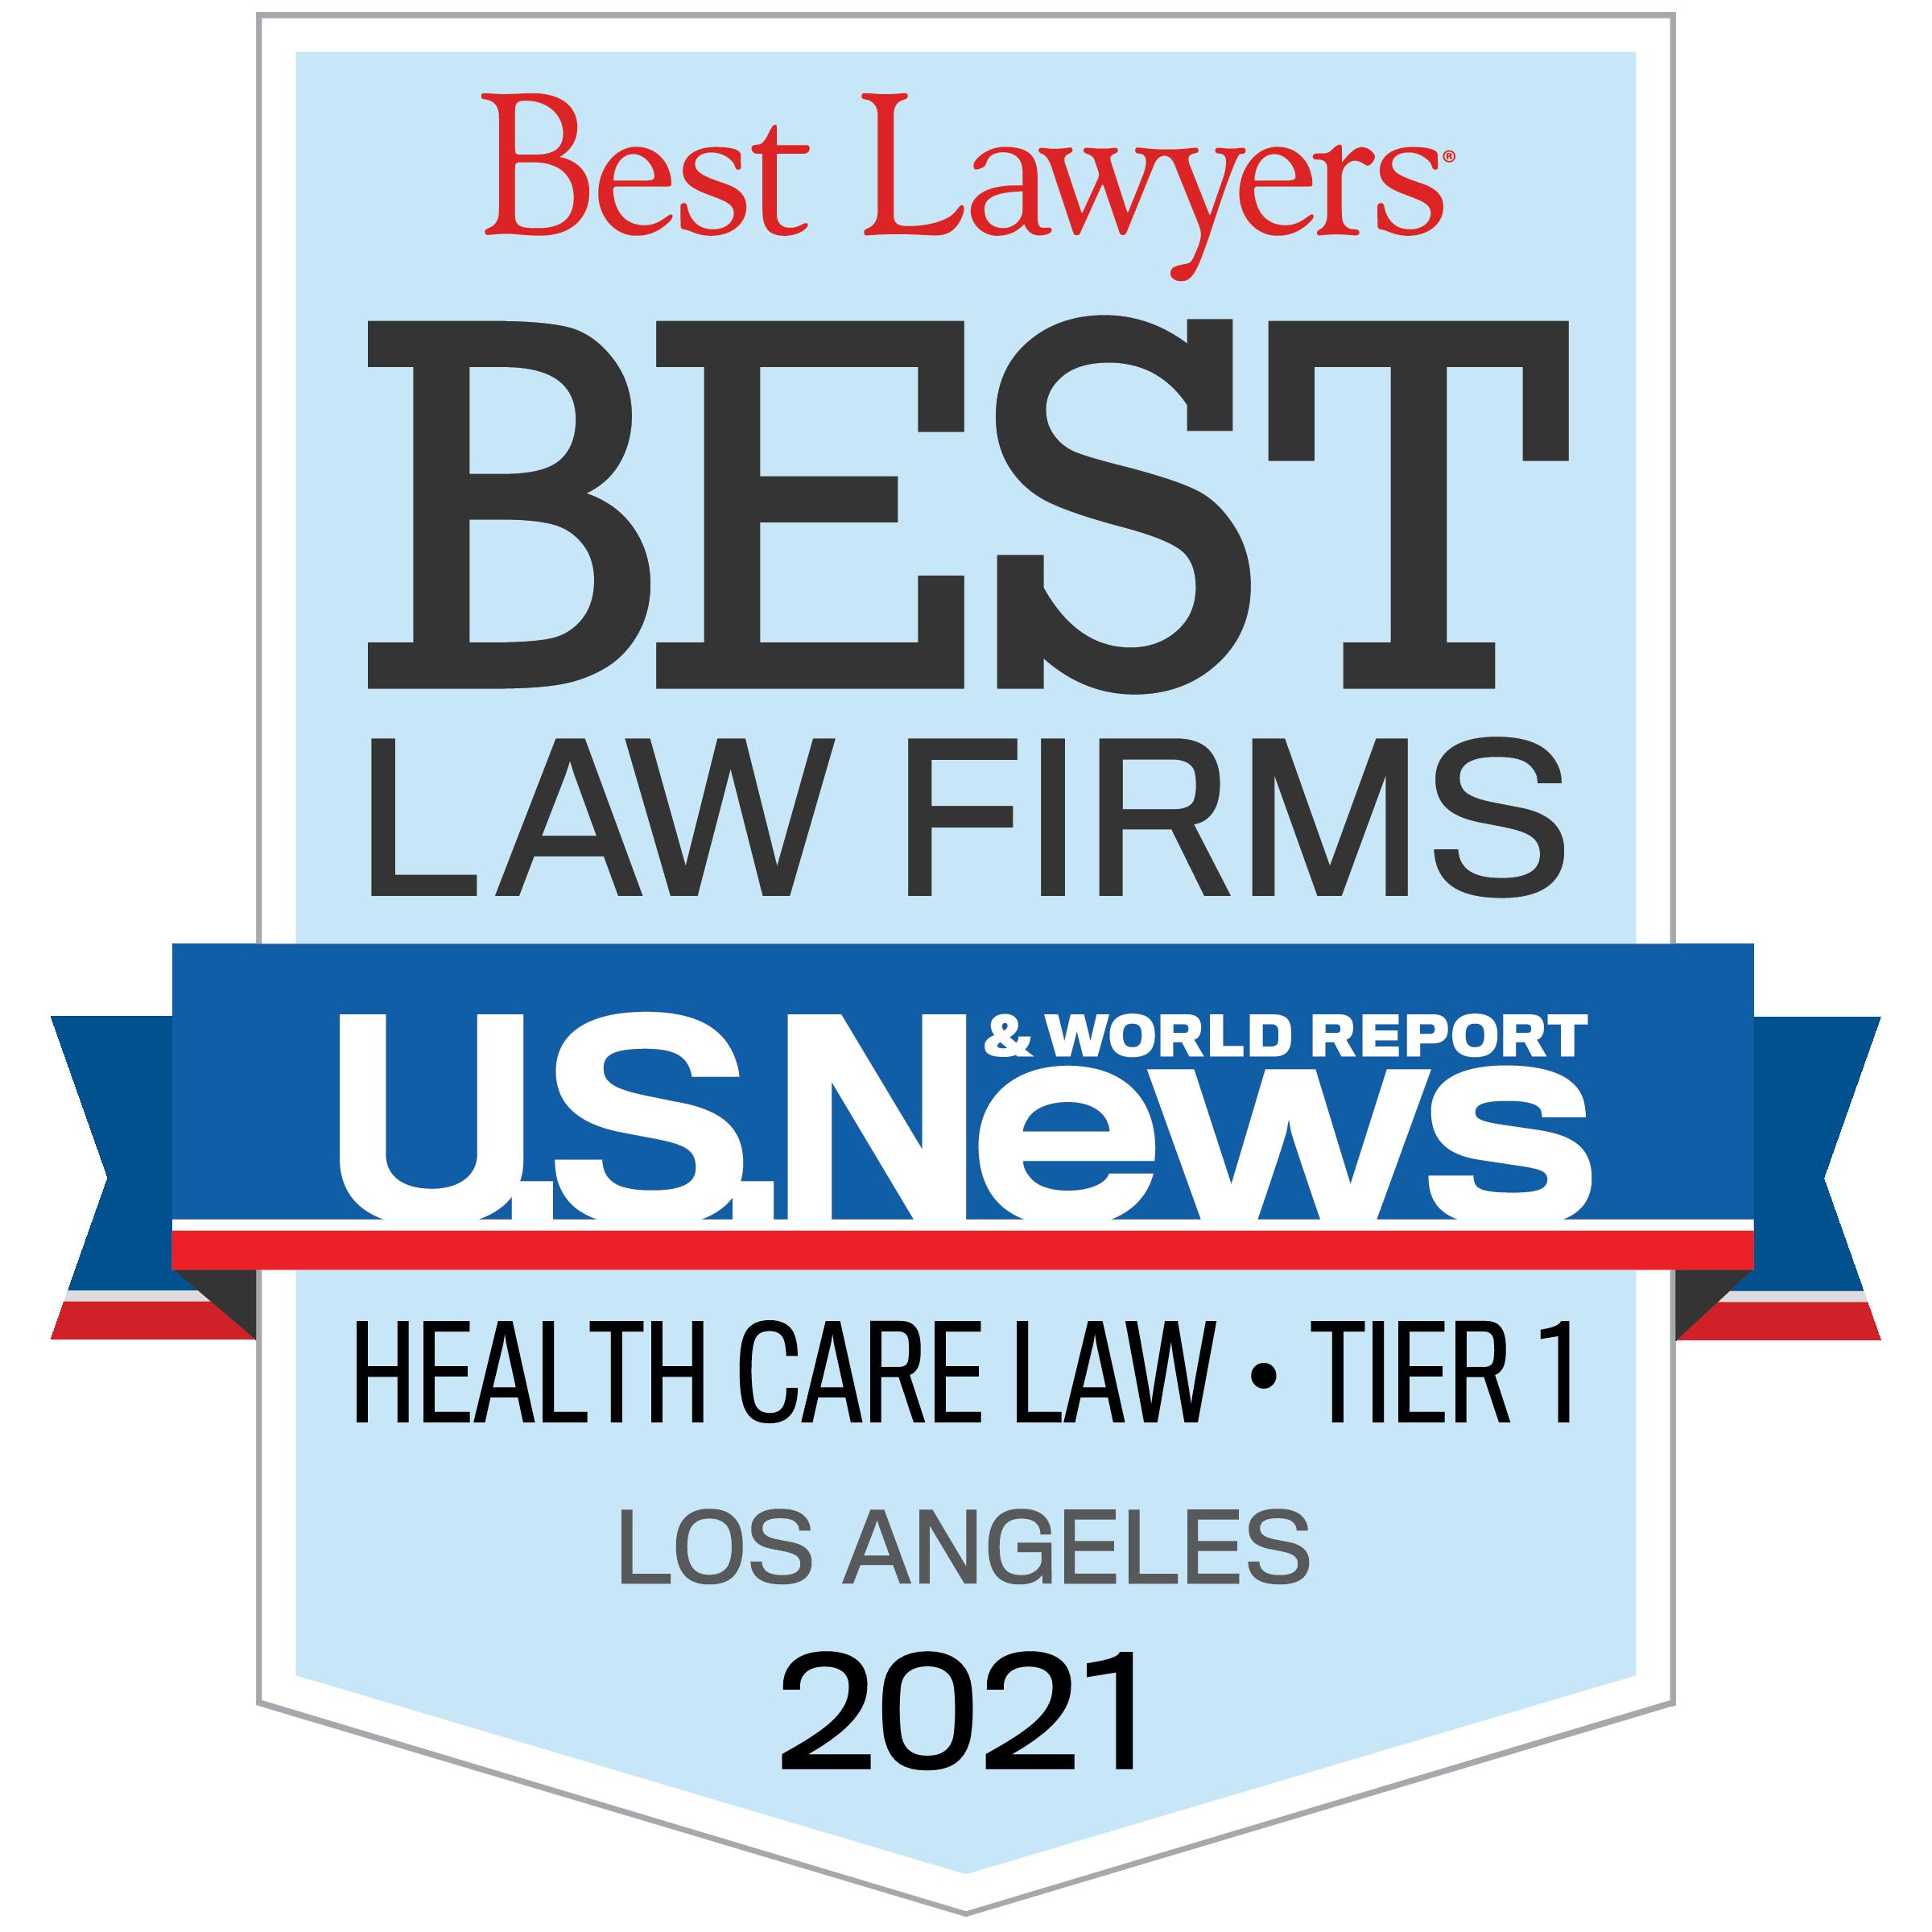 Best Law Firms - Regional Tier 1 Badge